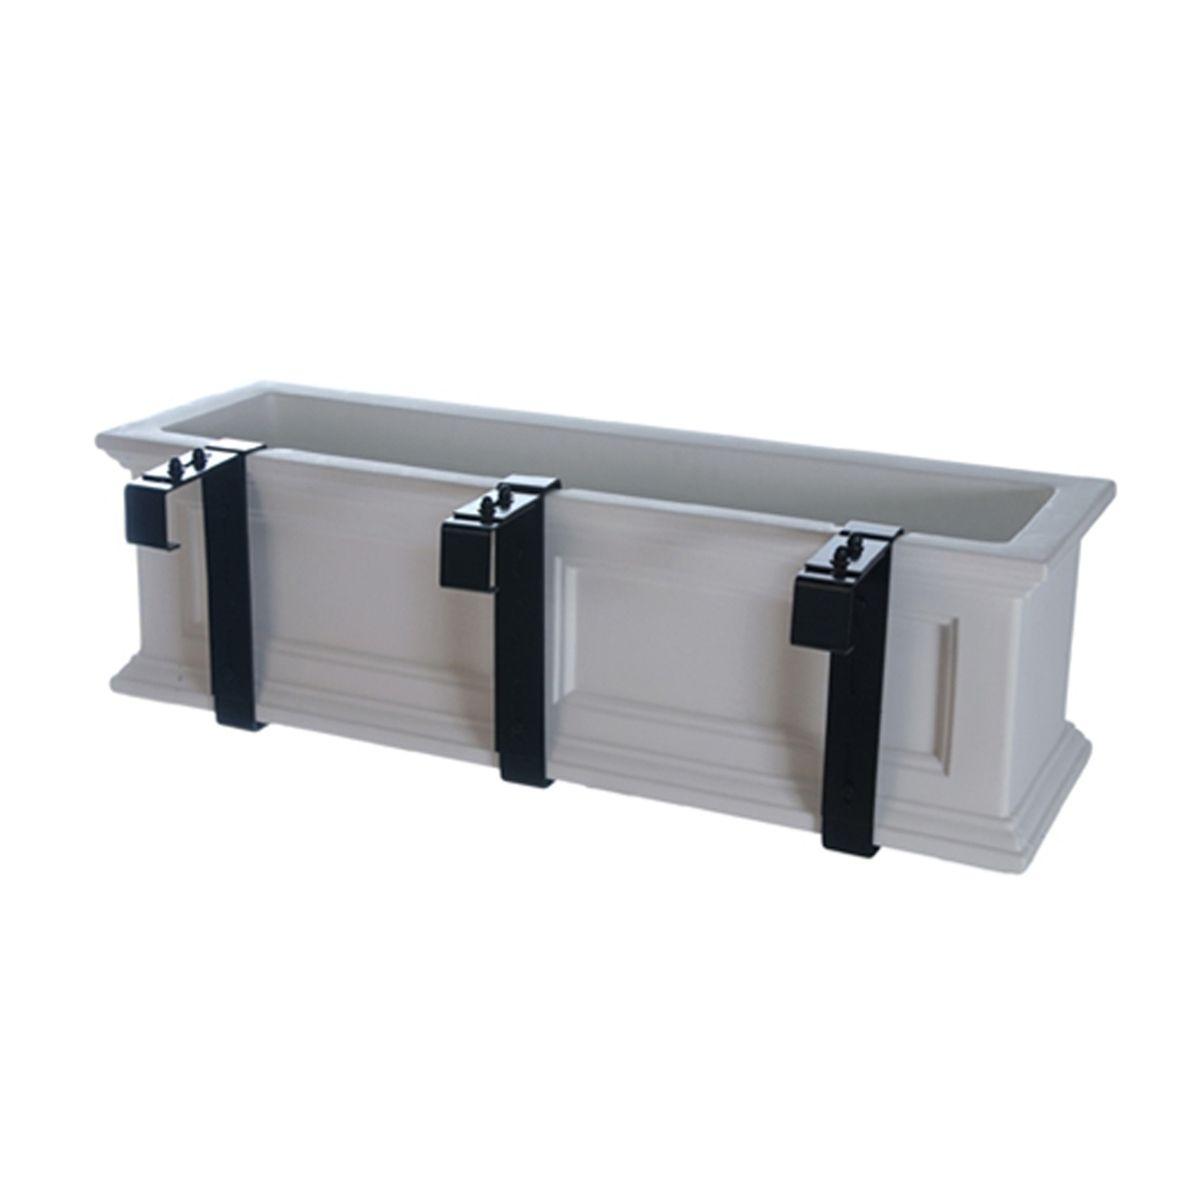 Exterior Solutions Adjustable Window Box Deck Rail Kit